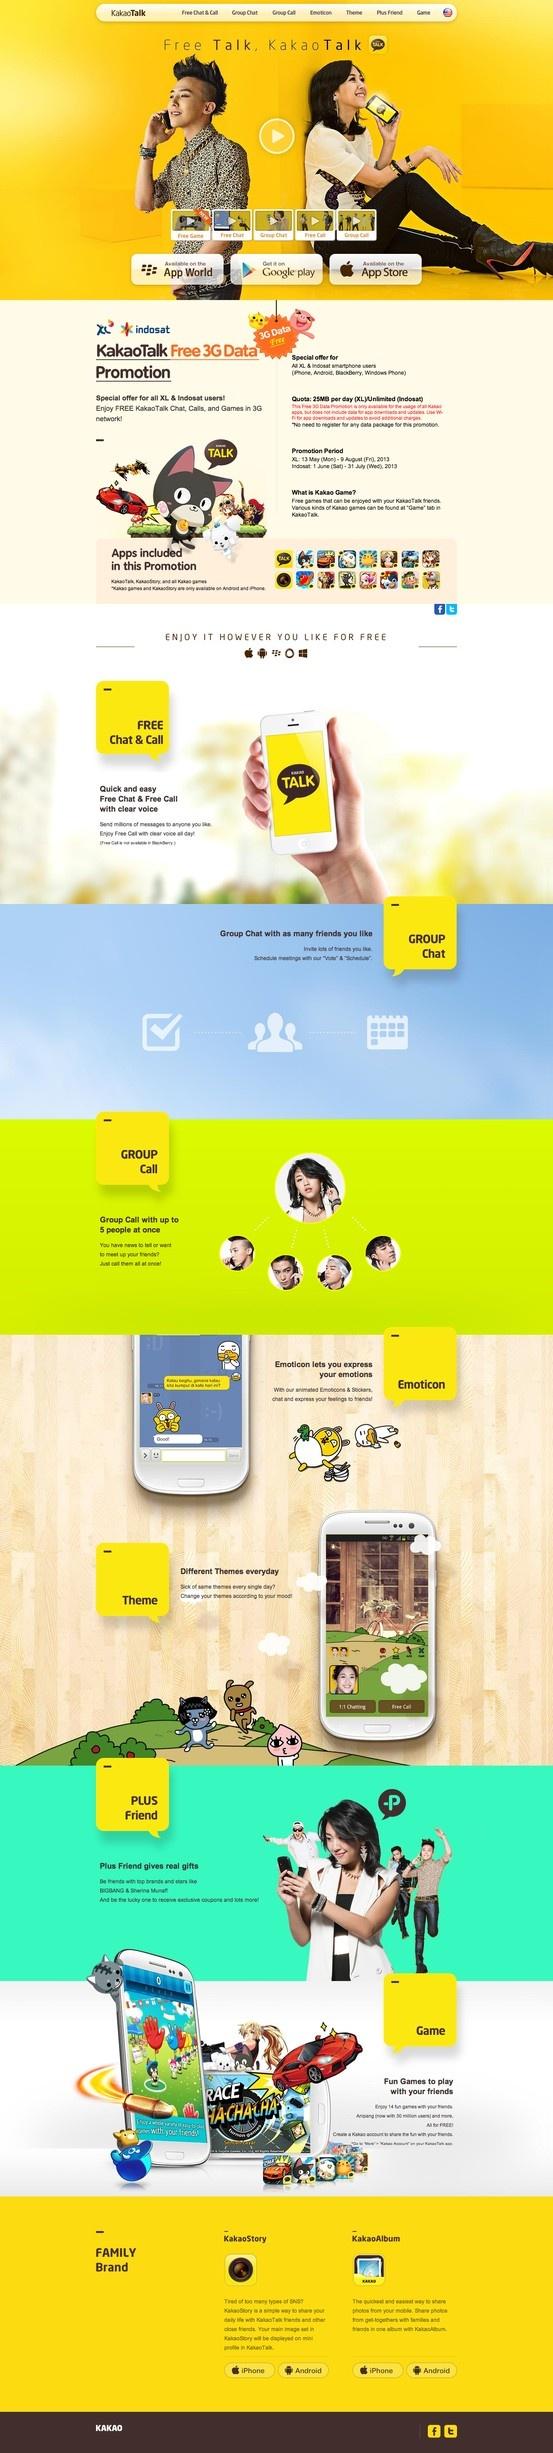 Unique Web Design, KakaoTalk #WebDesign #Design (http://www.pinterest.com/aldenchong/)